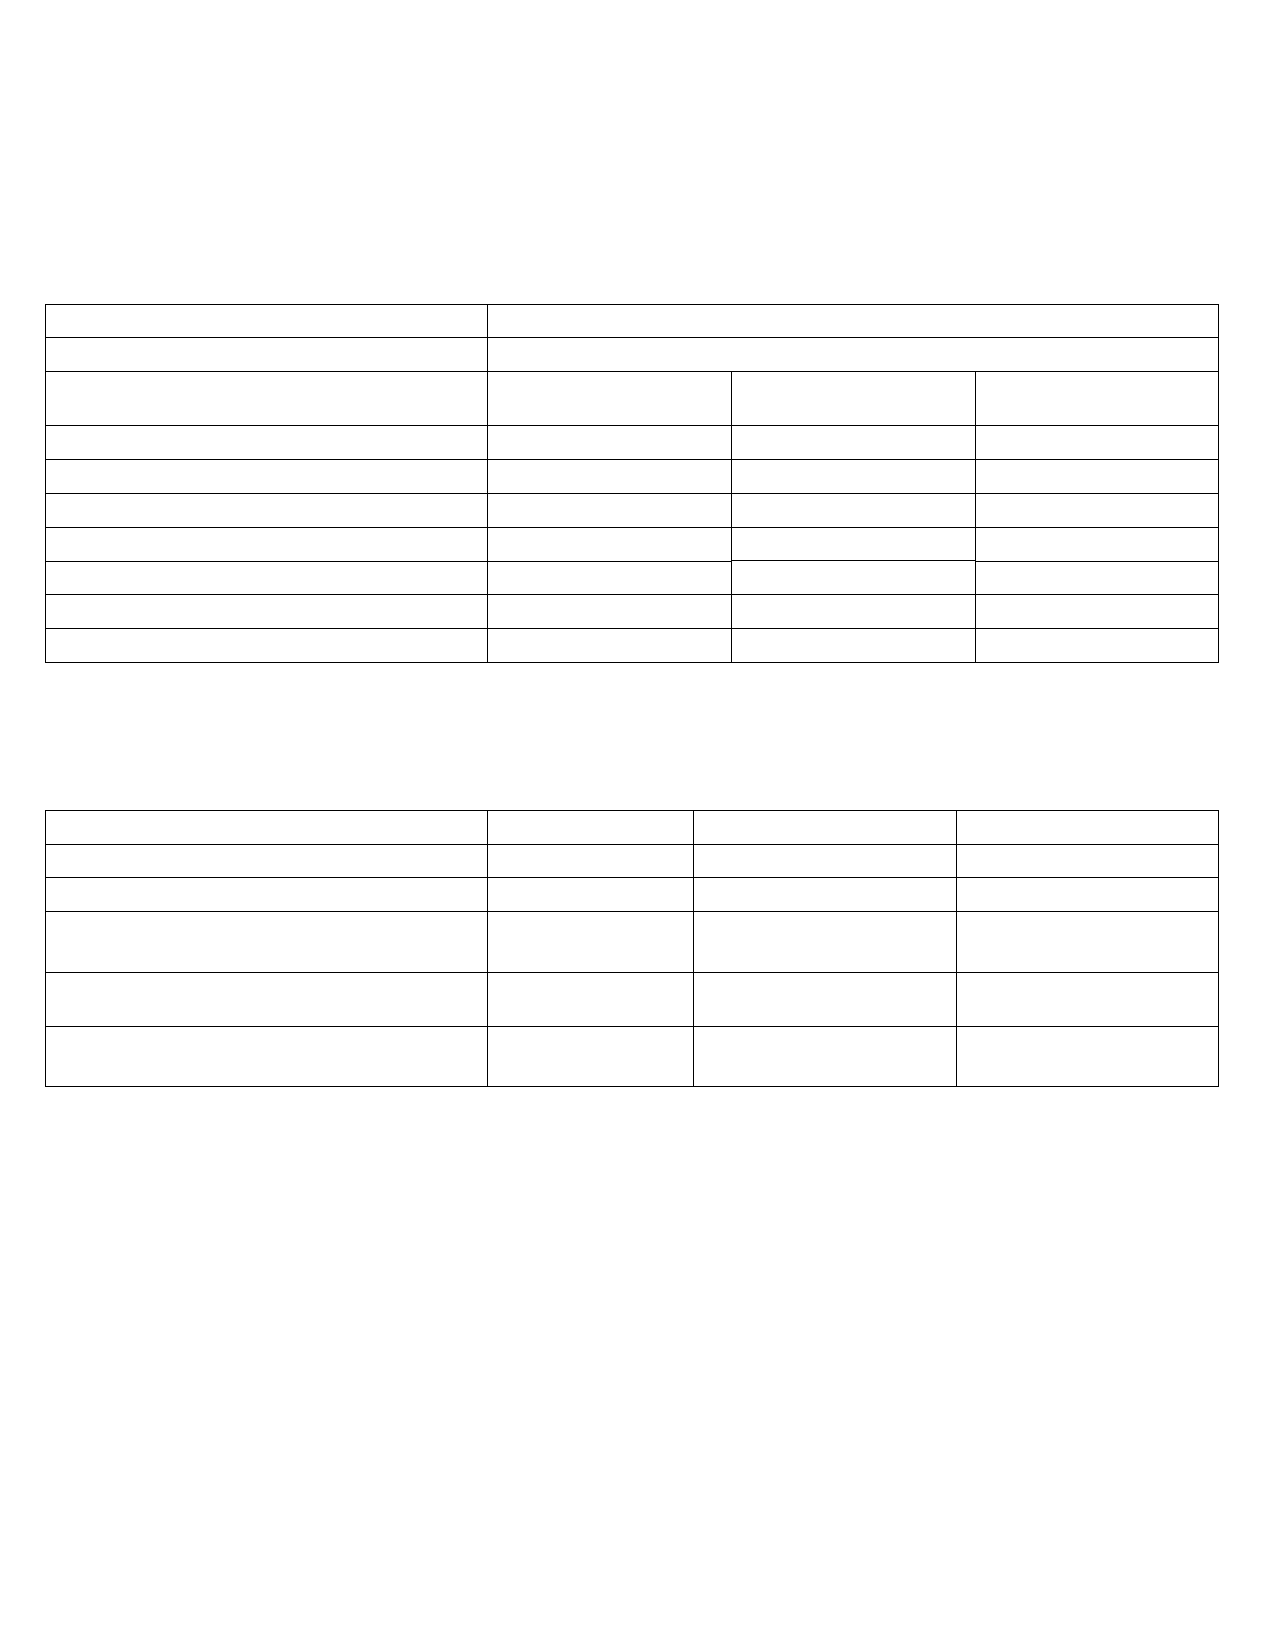 MR2408 데이터시트 및 MR2408 PDF